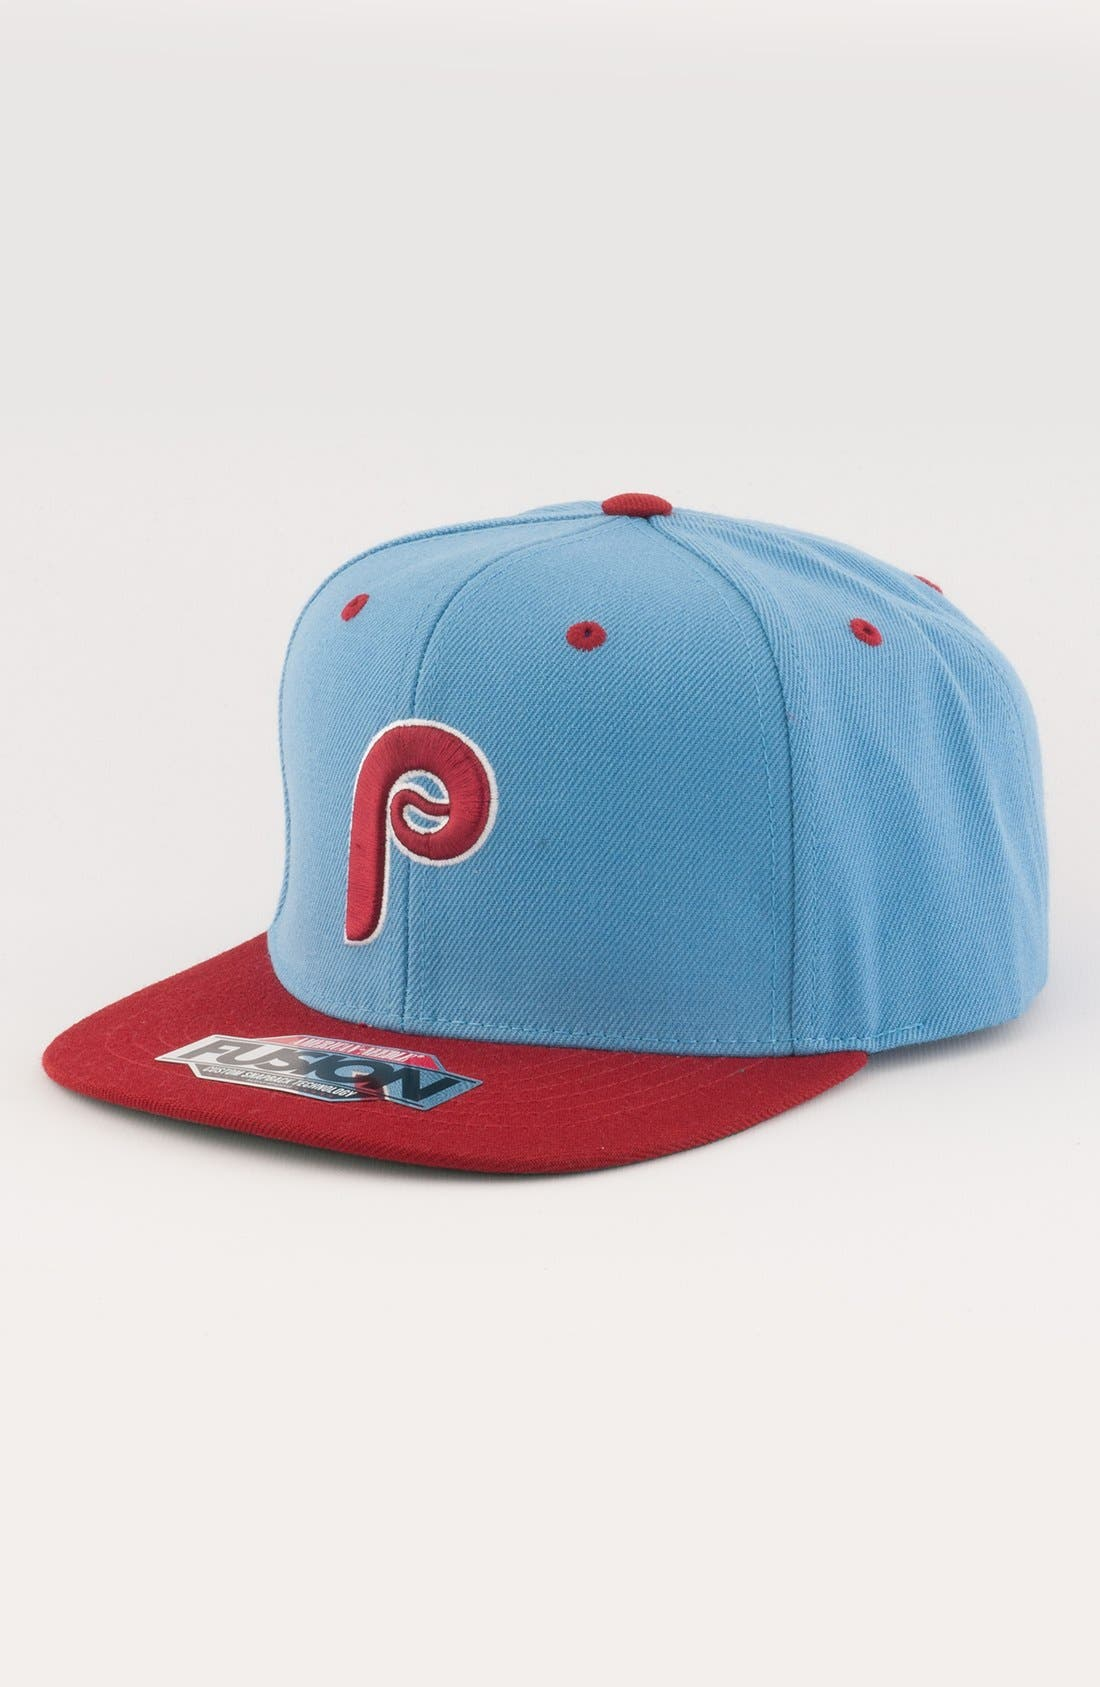 Main Image - American Needle 'Philadelphia Phillies - Back 2 Front' Snapback Baseball Cap